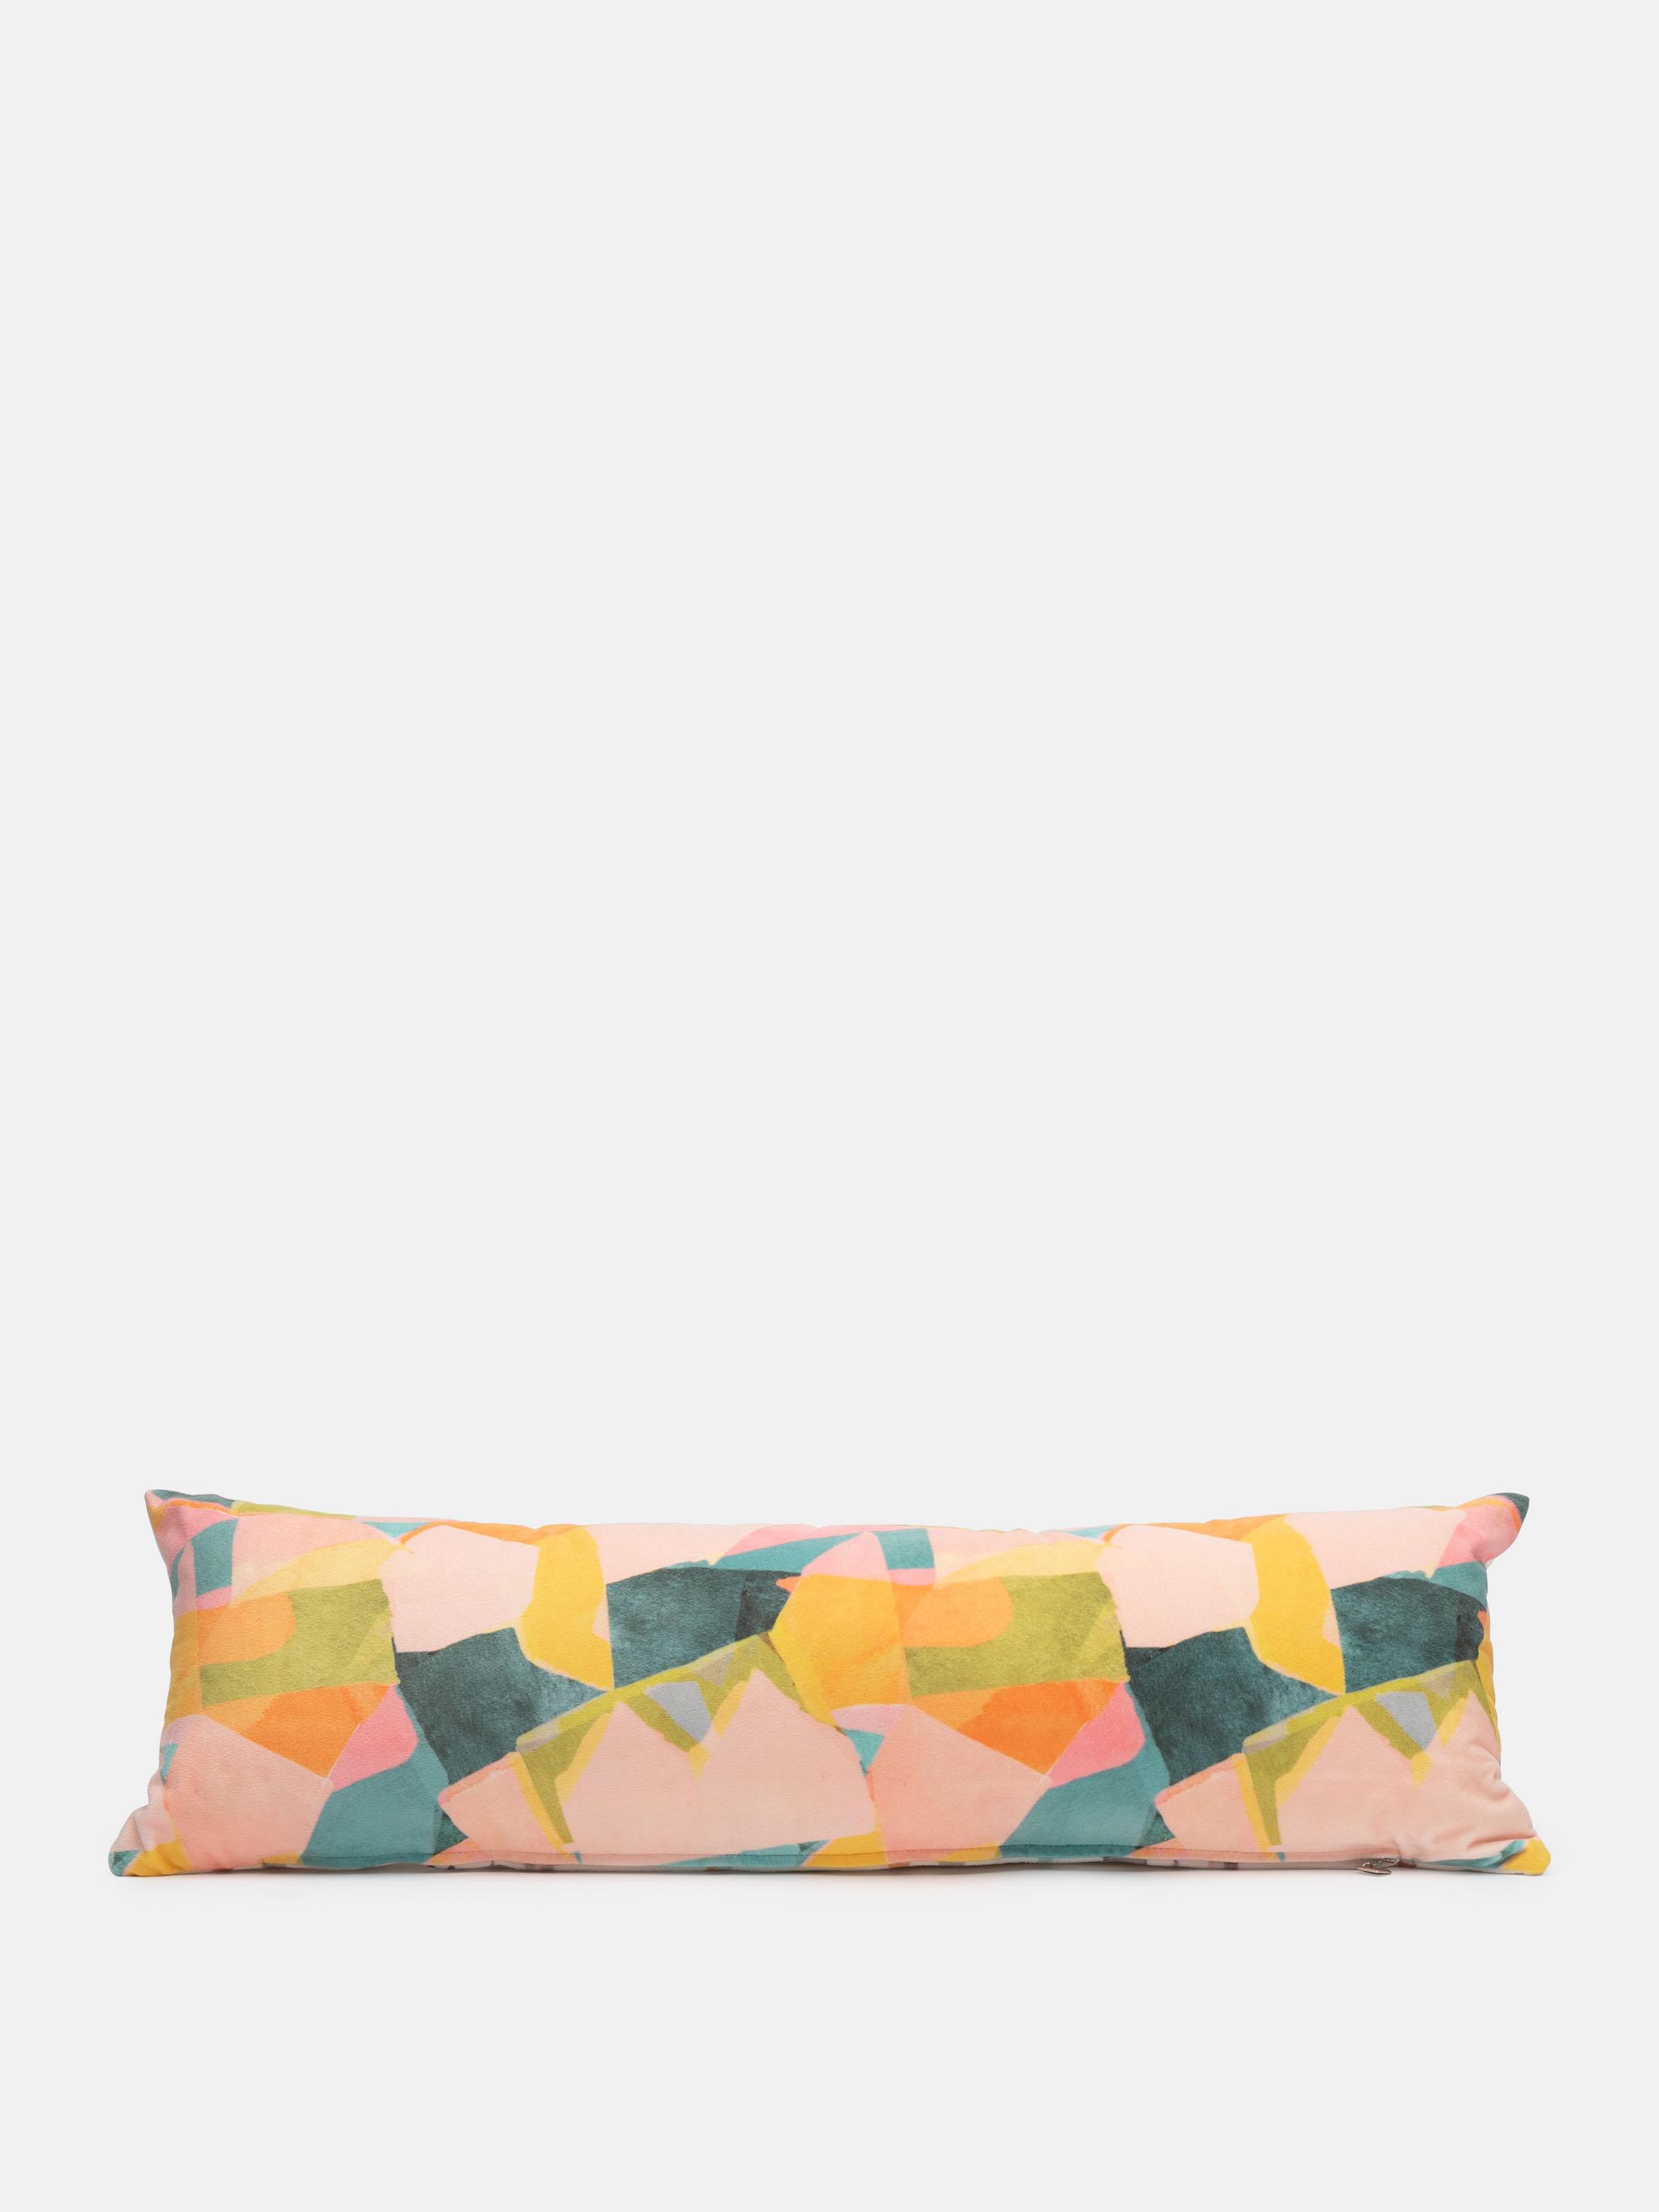 design your own body pillow custom